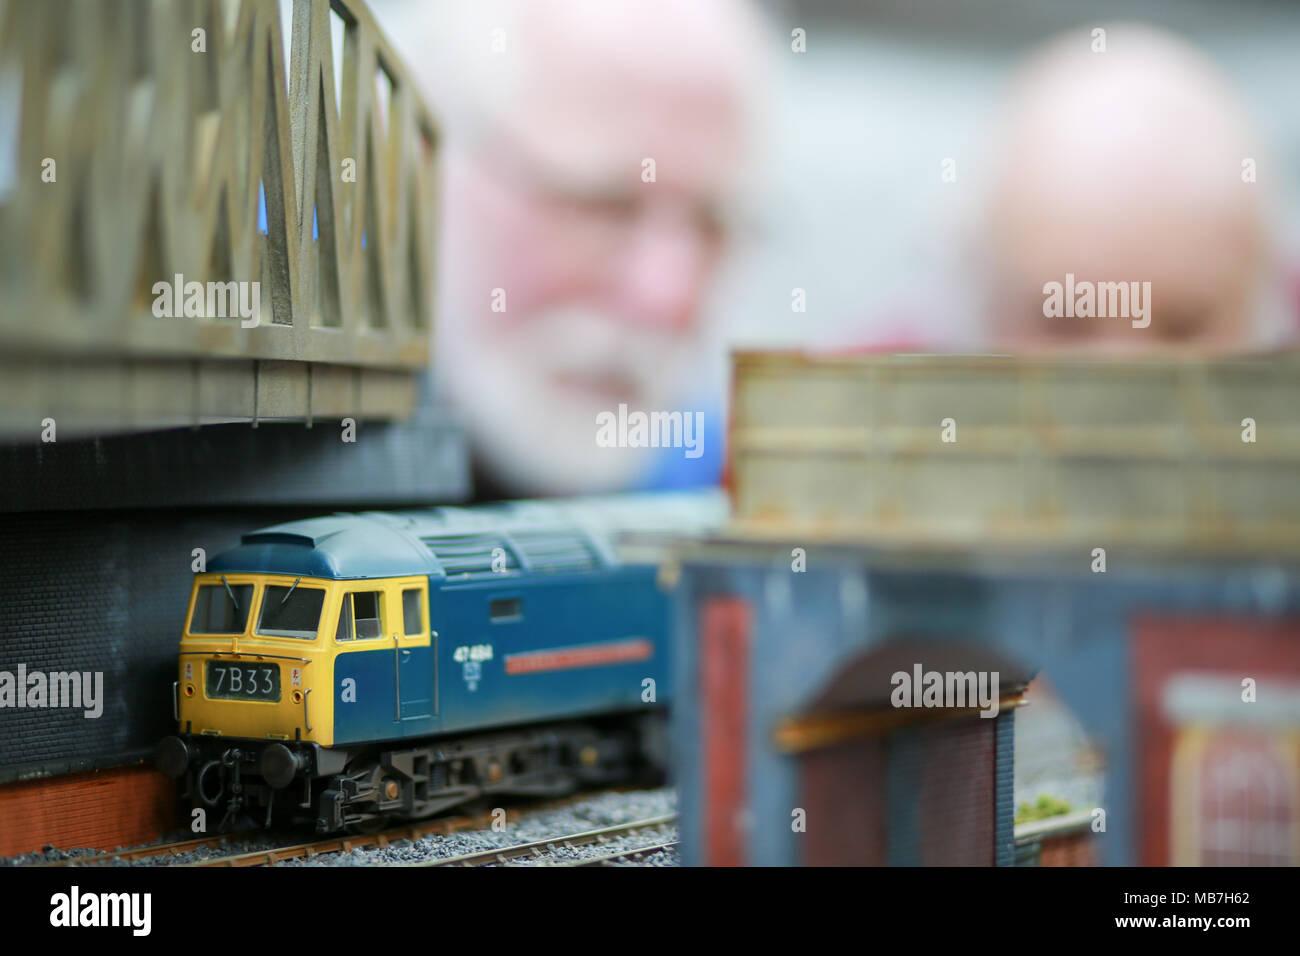 Model Railway Layout Stock Photos & Model Railway Layout Stock